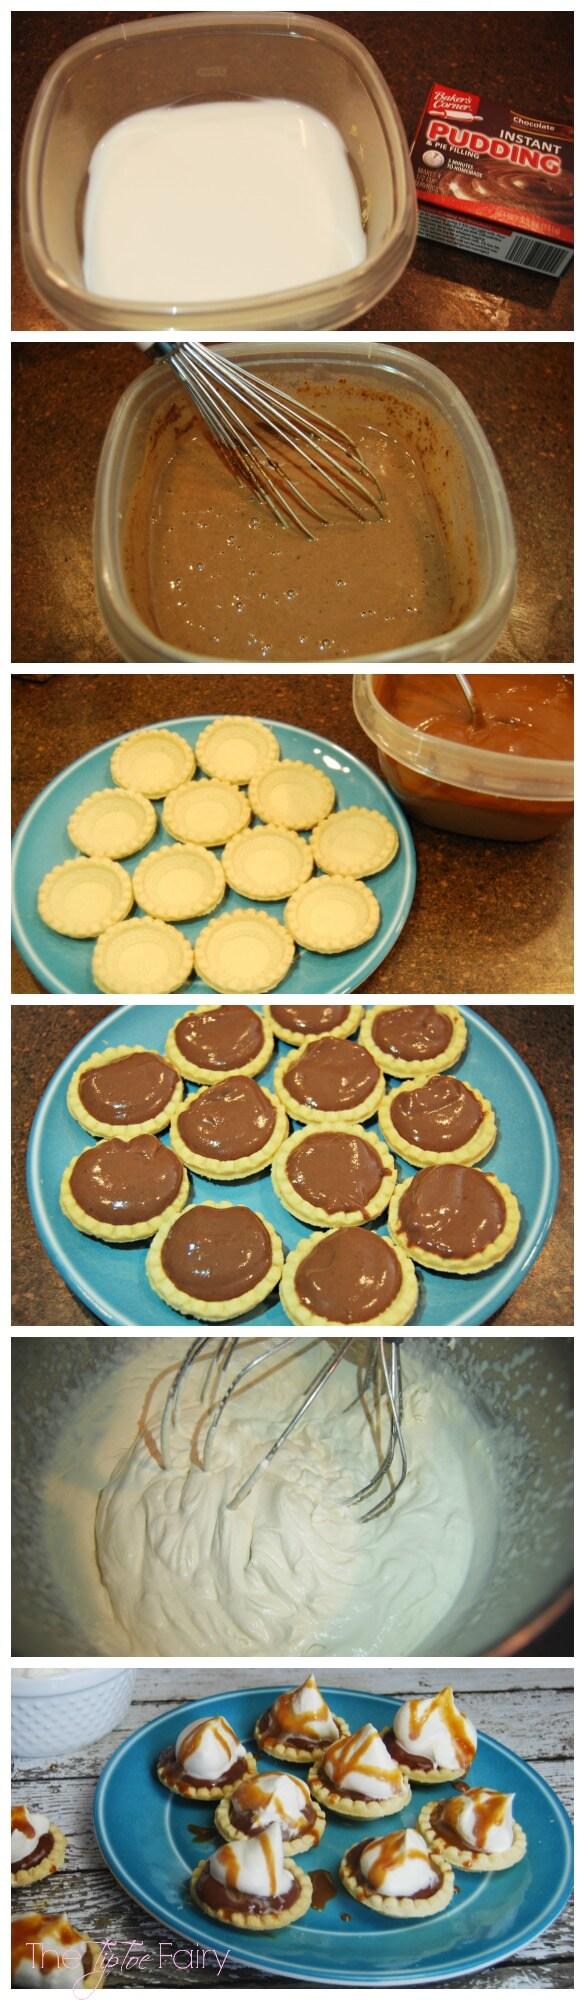 Easy weeknight dessert - Chocolate Caramel Cream Pie Bites w dulce de leche syrup #chocolate #dessert